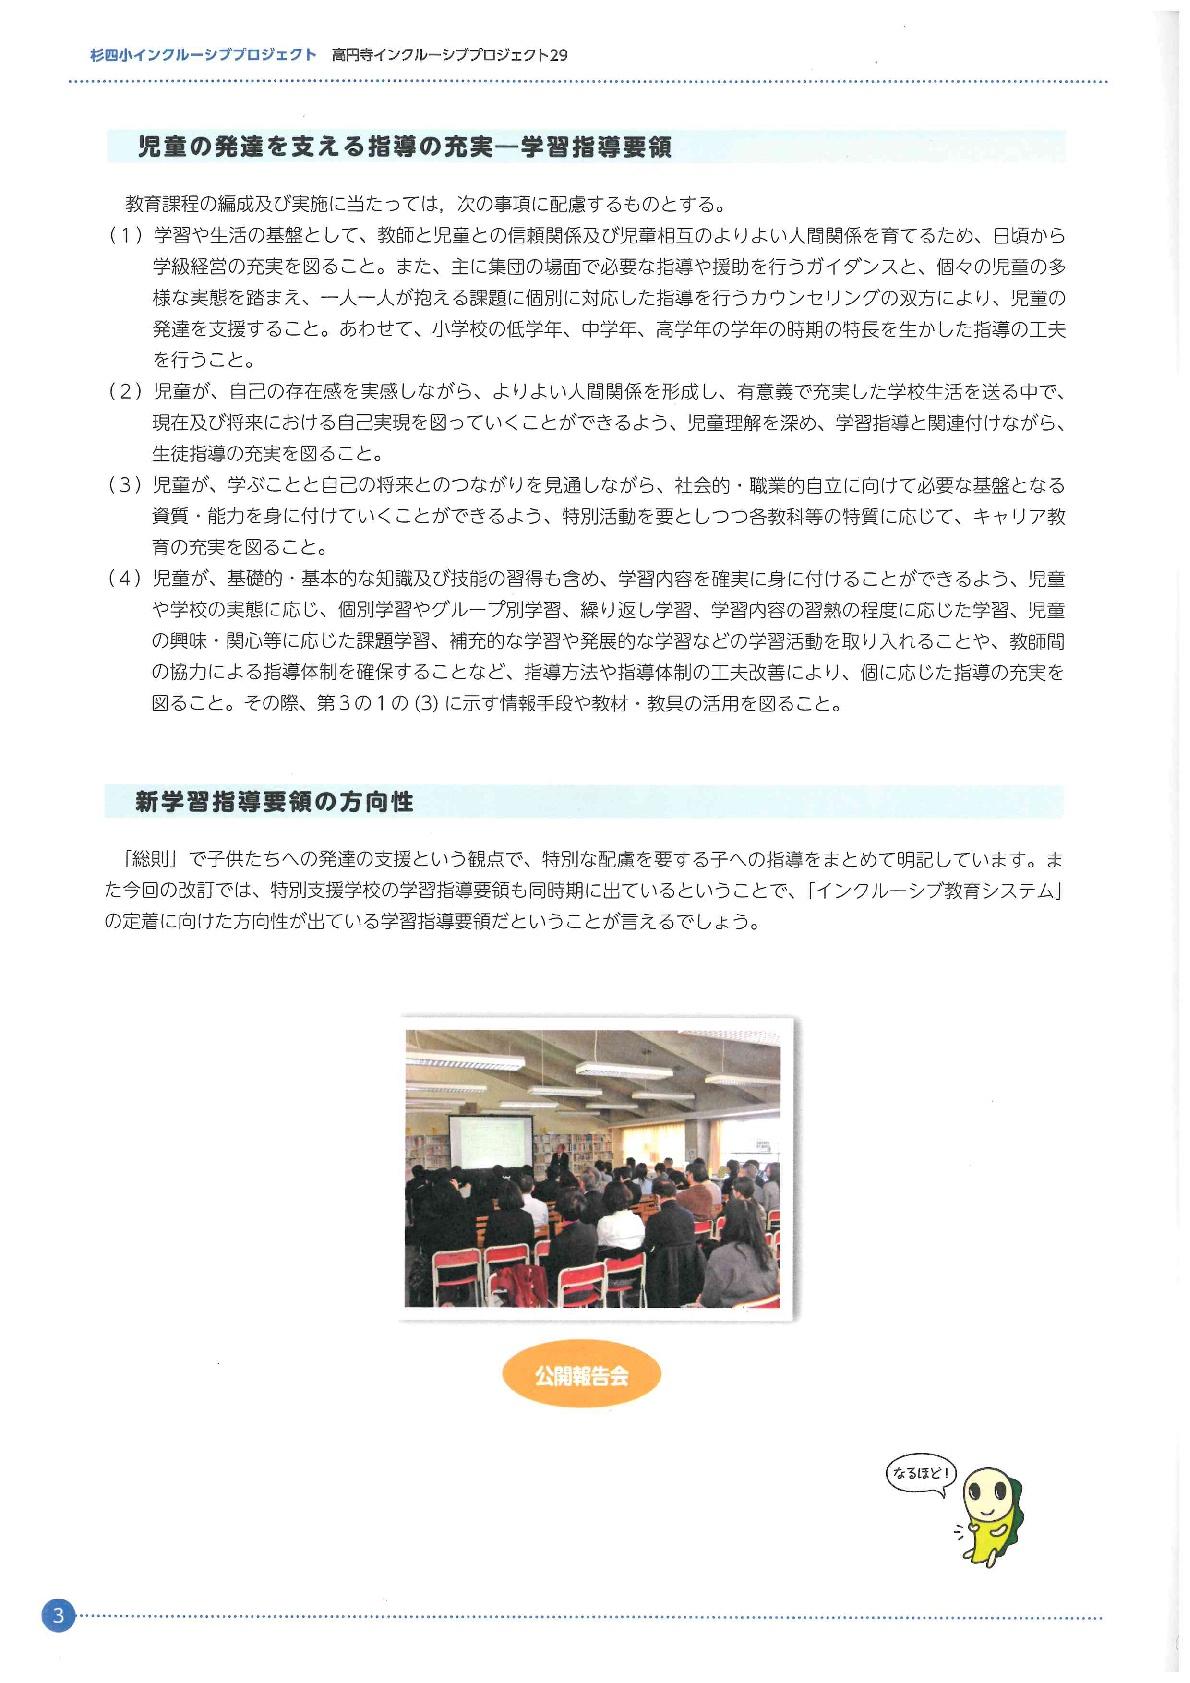 InclusiveLeaflet-004.jpg